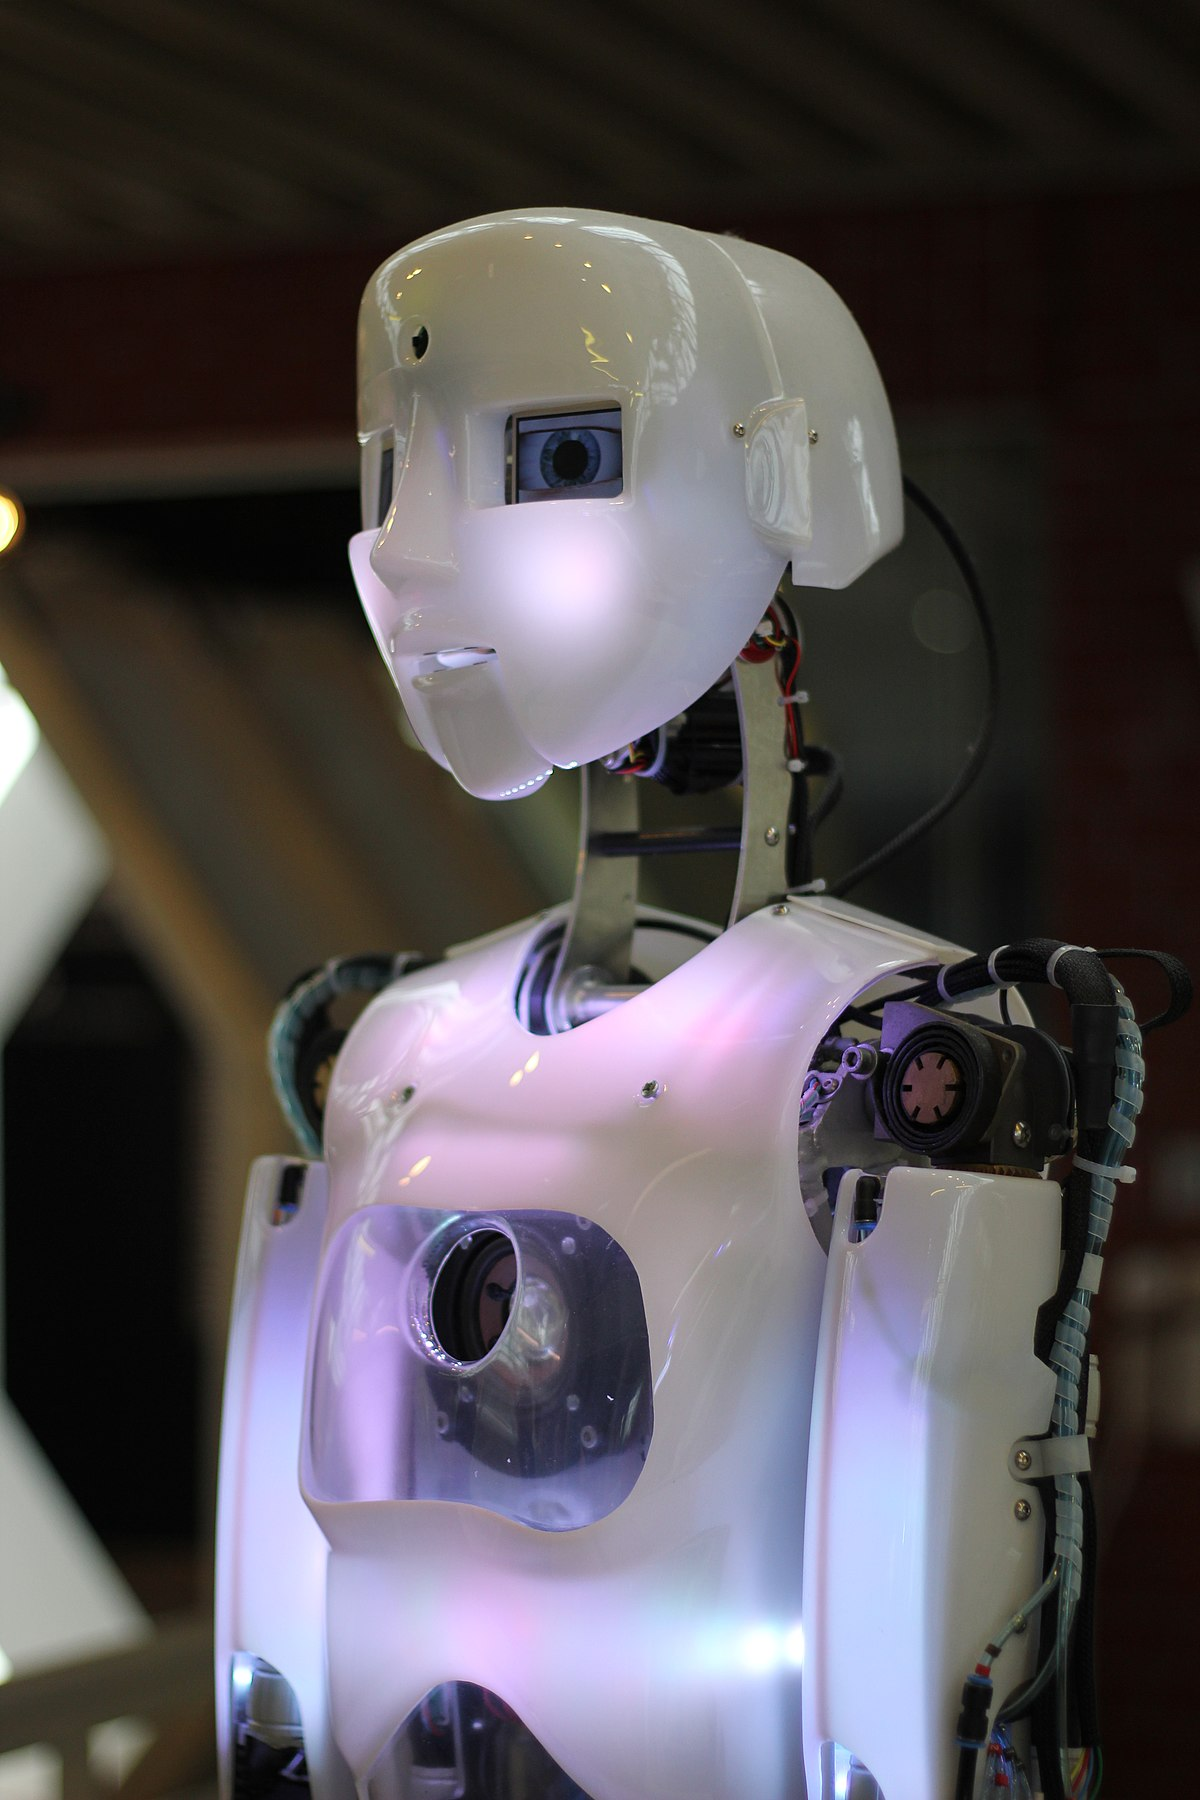 Humanoid Robot Wikipedia Obstacle Avoiding 8211 Tiny Bot Project